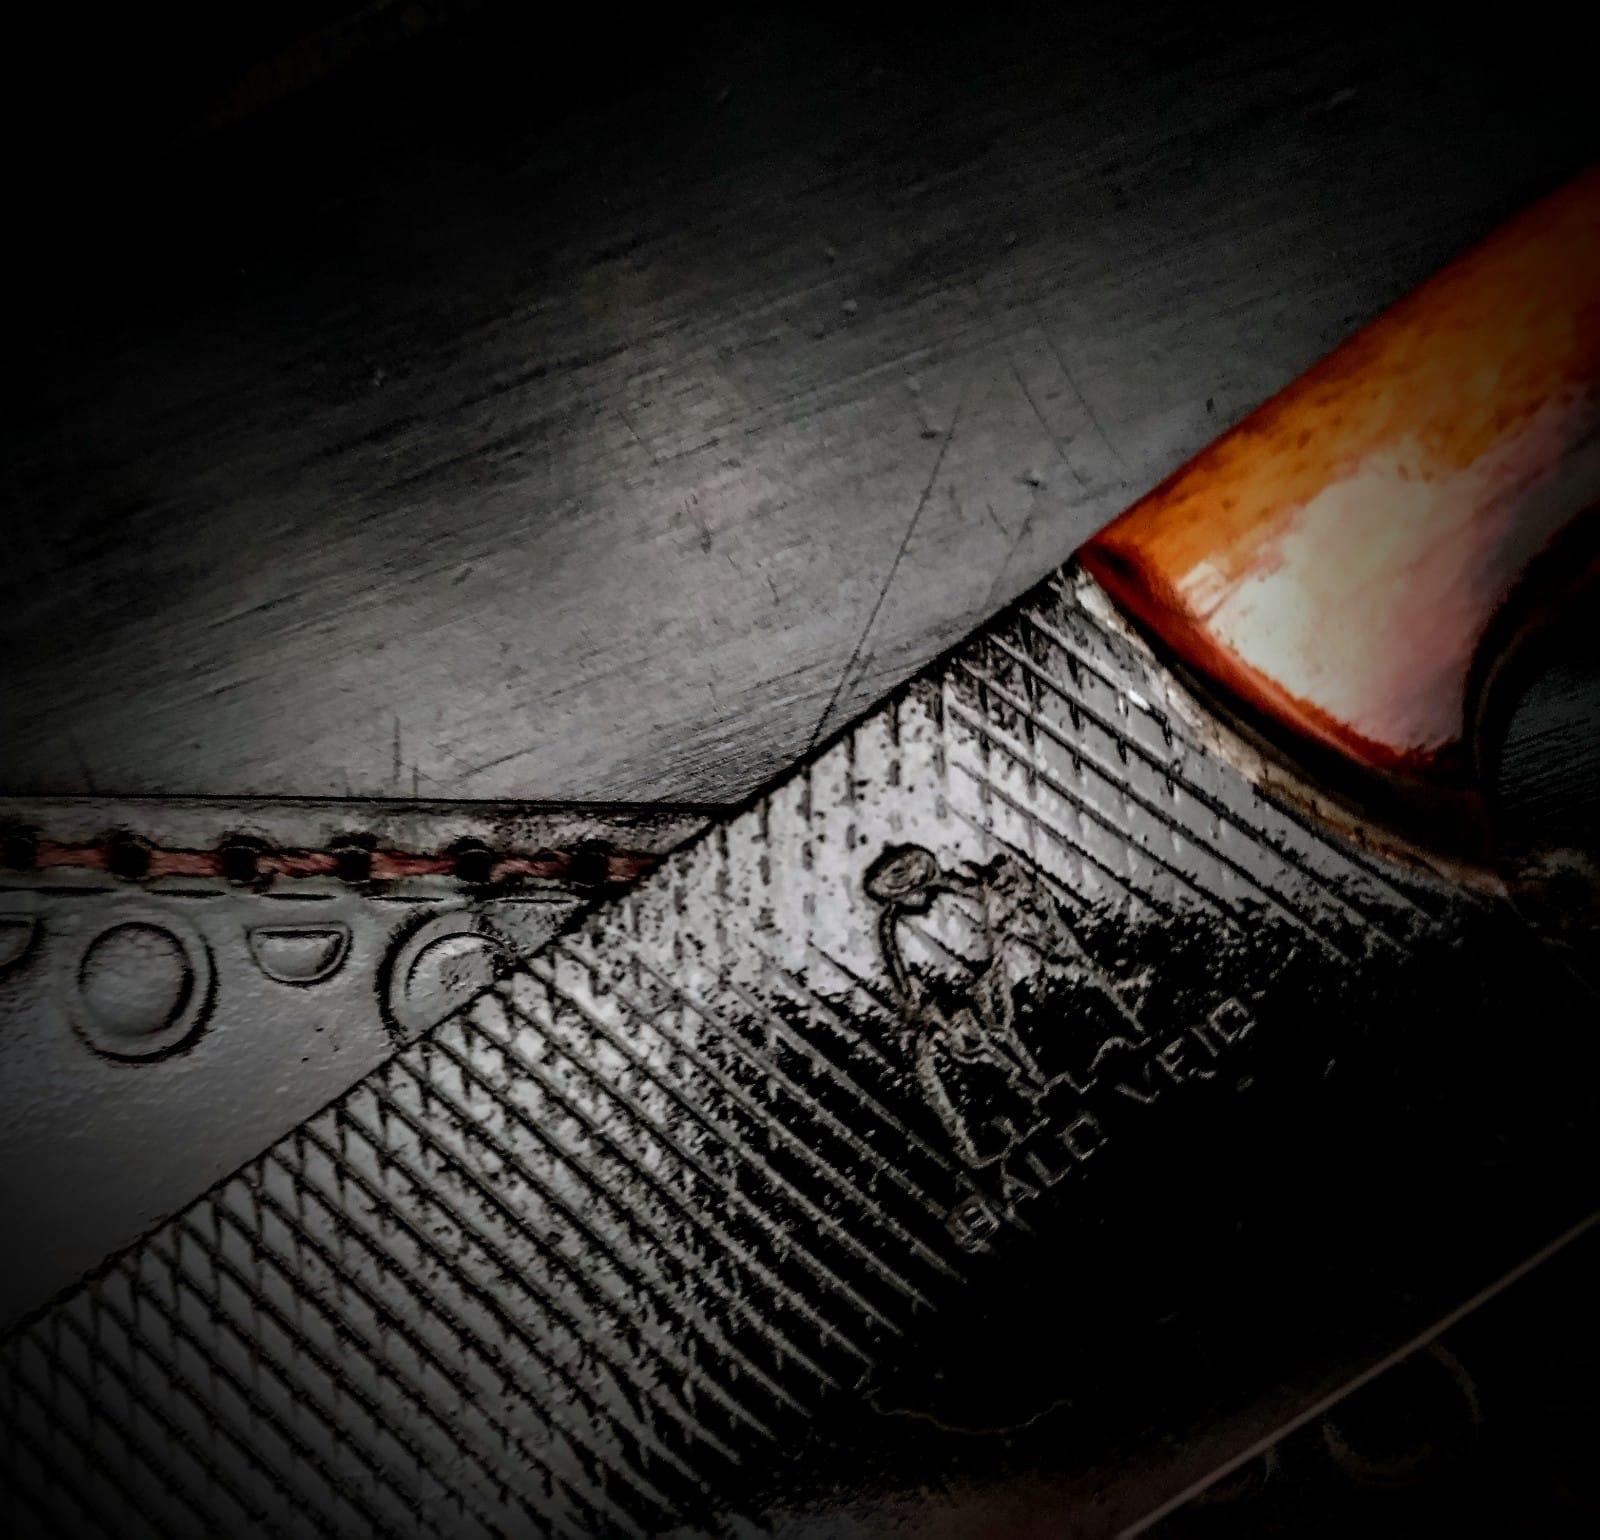 Faca artesanal negra galo veio de grosa antiga 09 polegadas